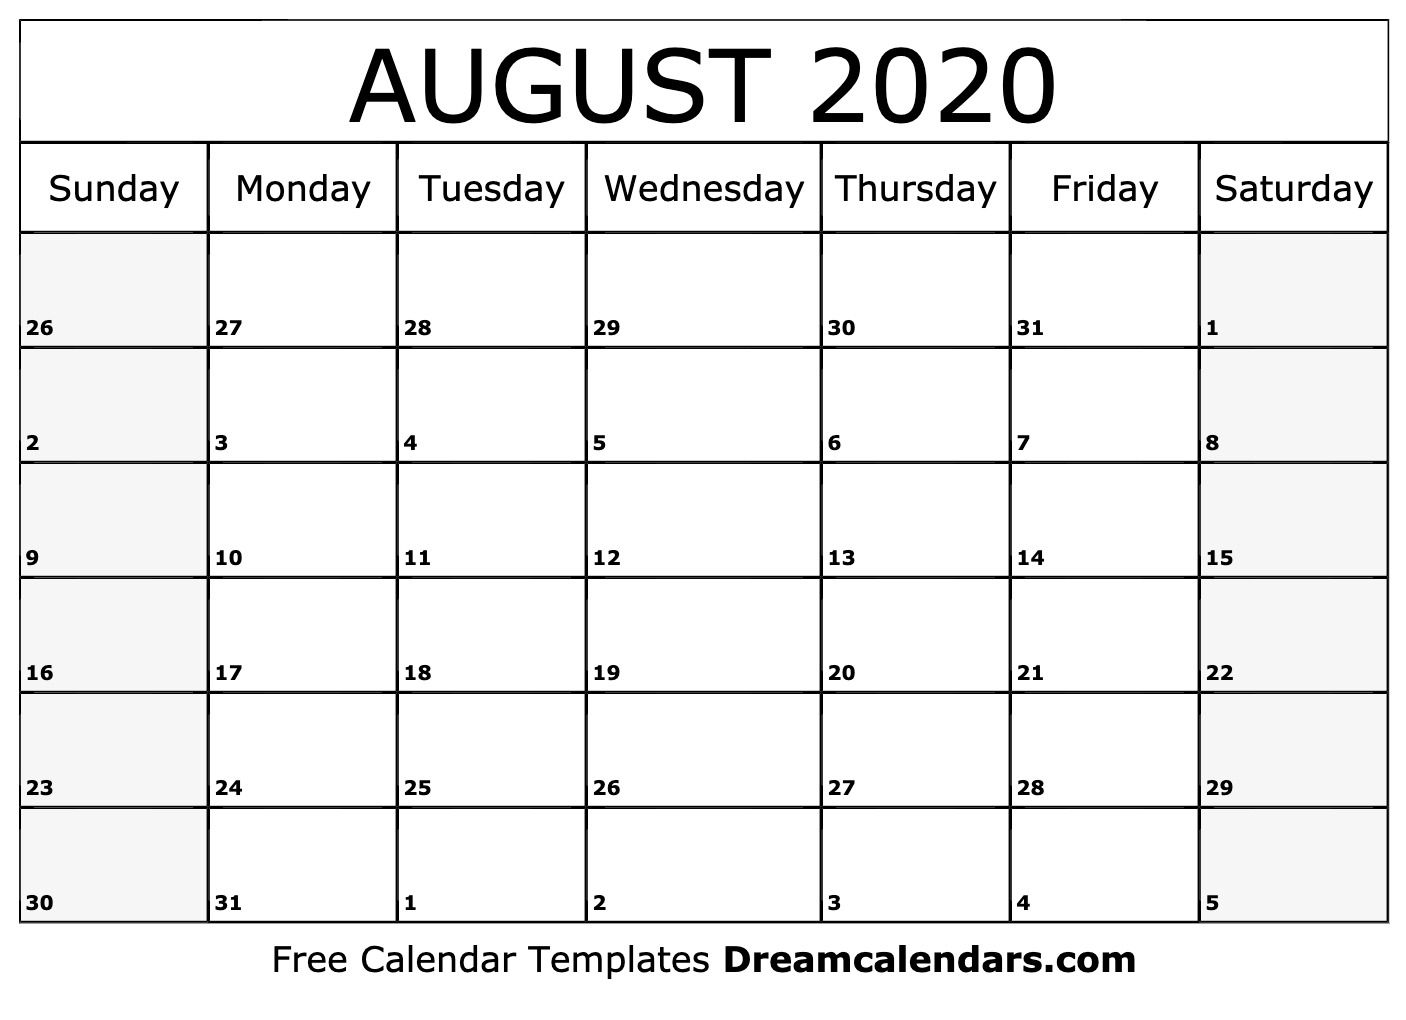 Free Blank August 2020 Printable Calendar regarding Kalendar Kuda July 2020